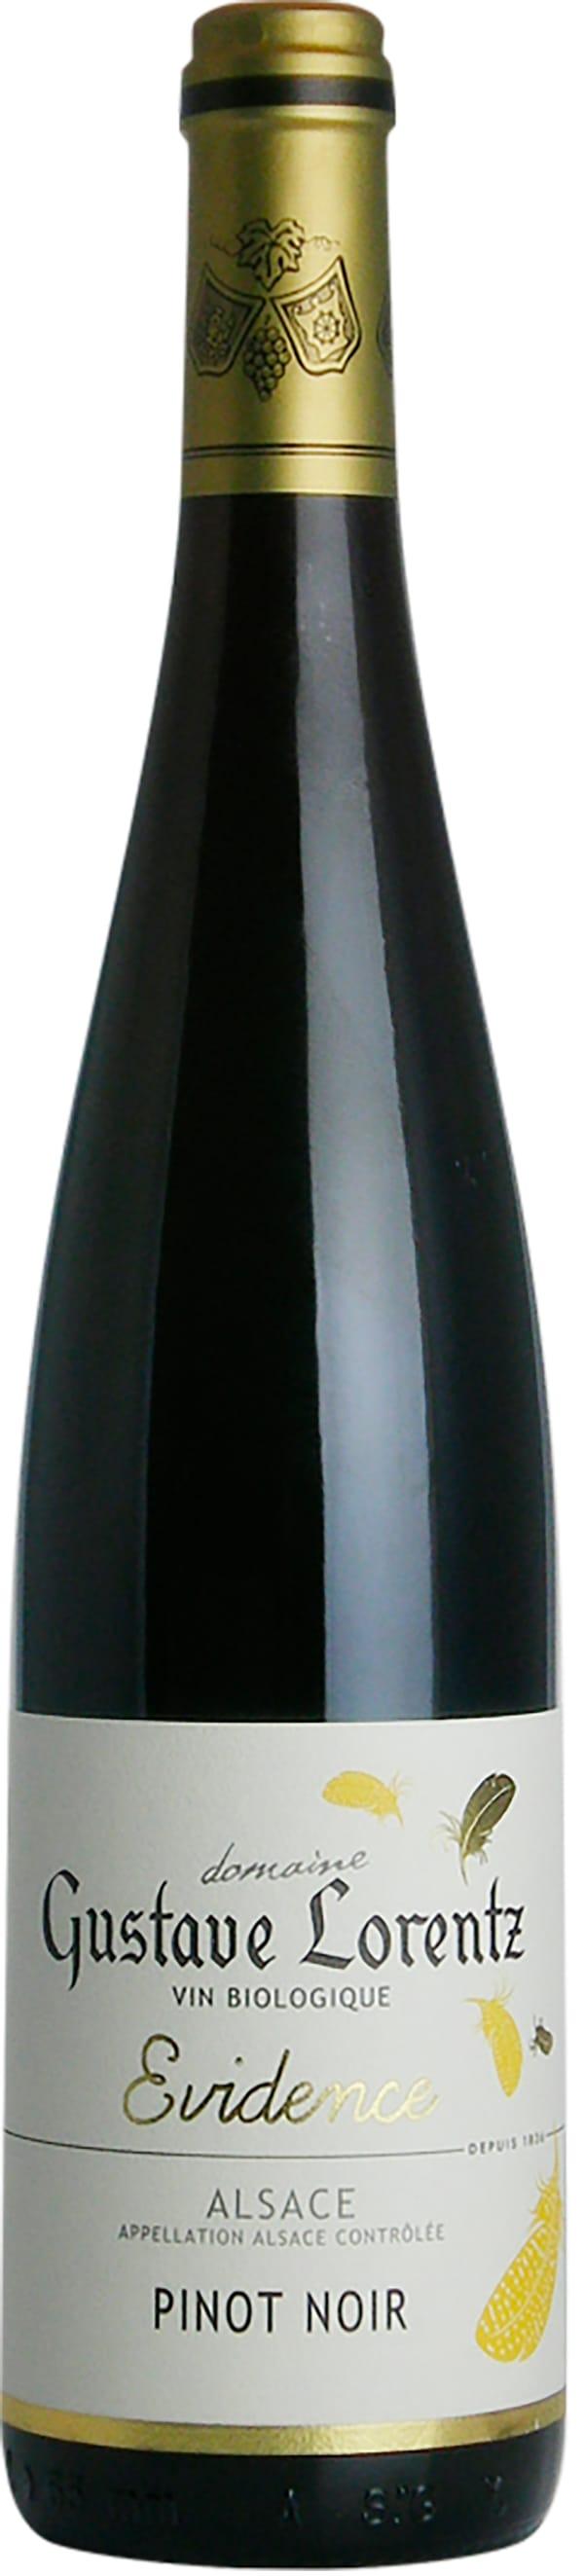 Gustave Lorentz Évidence Pinot Noir  2017